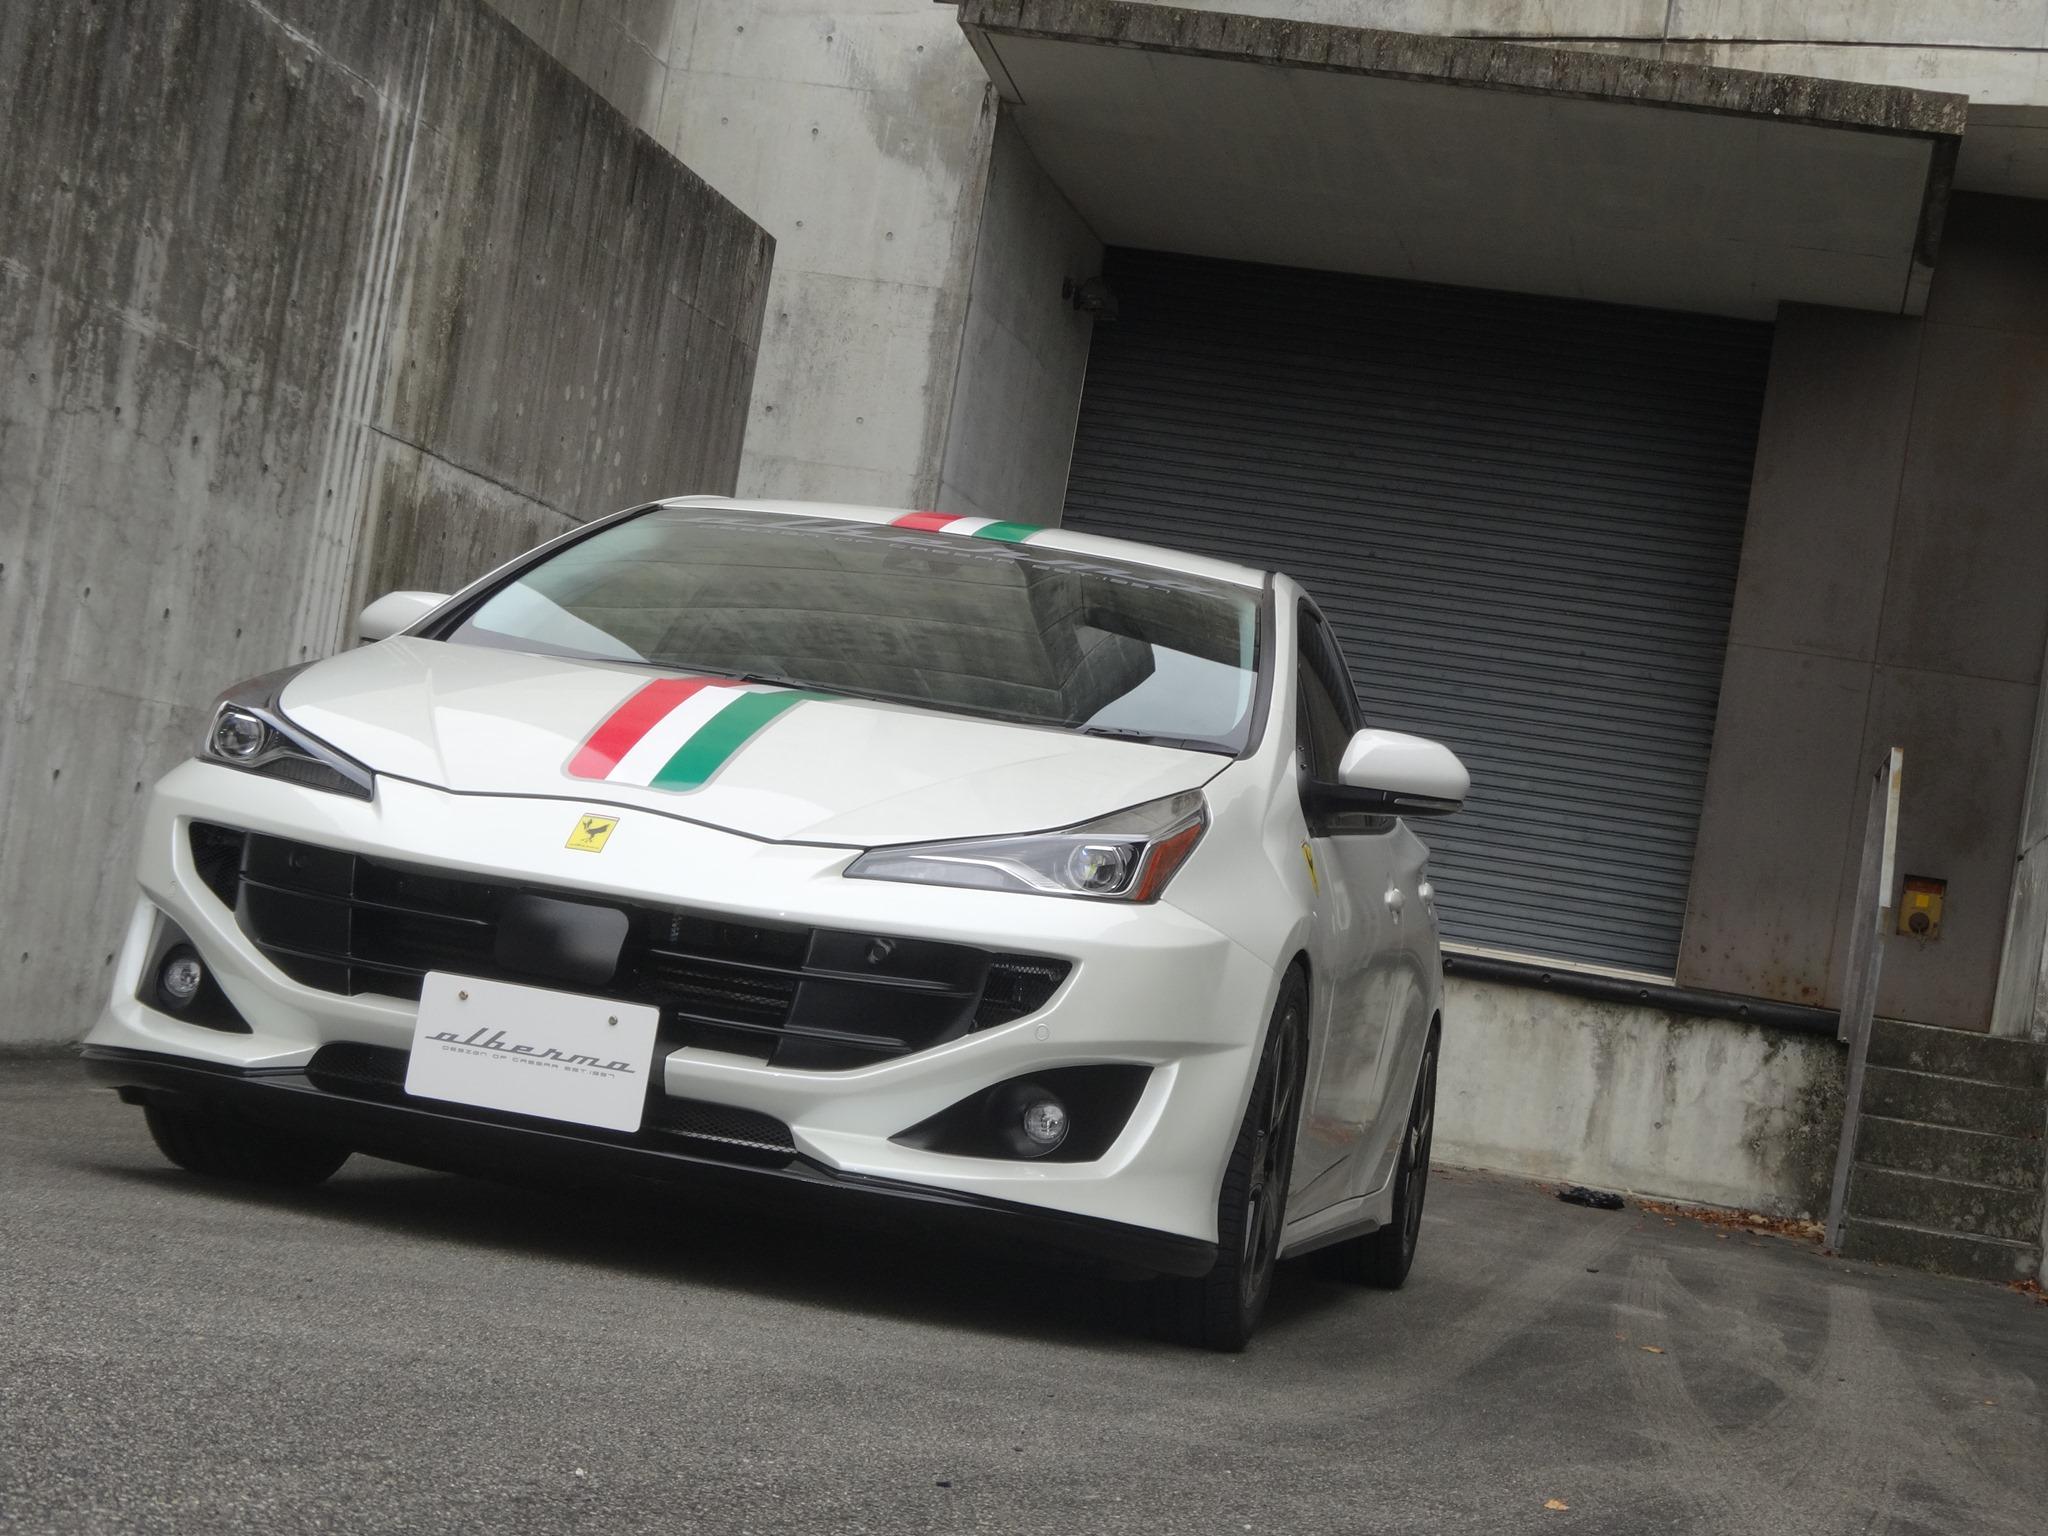 Toyota-Prius-by-Albermo-33